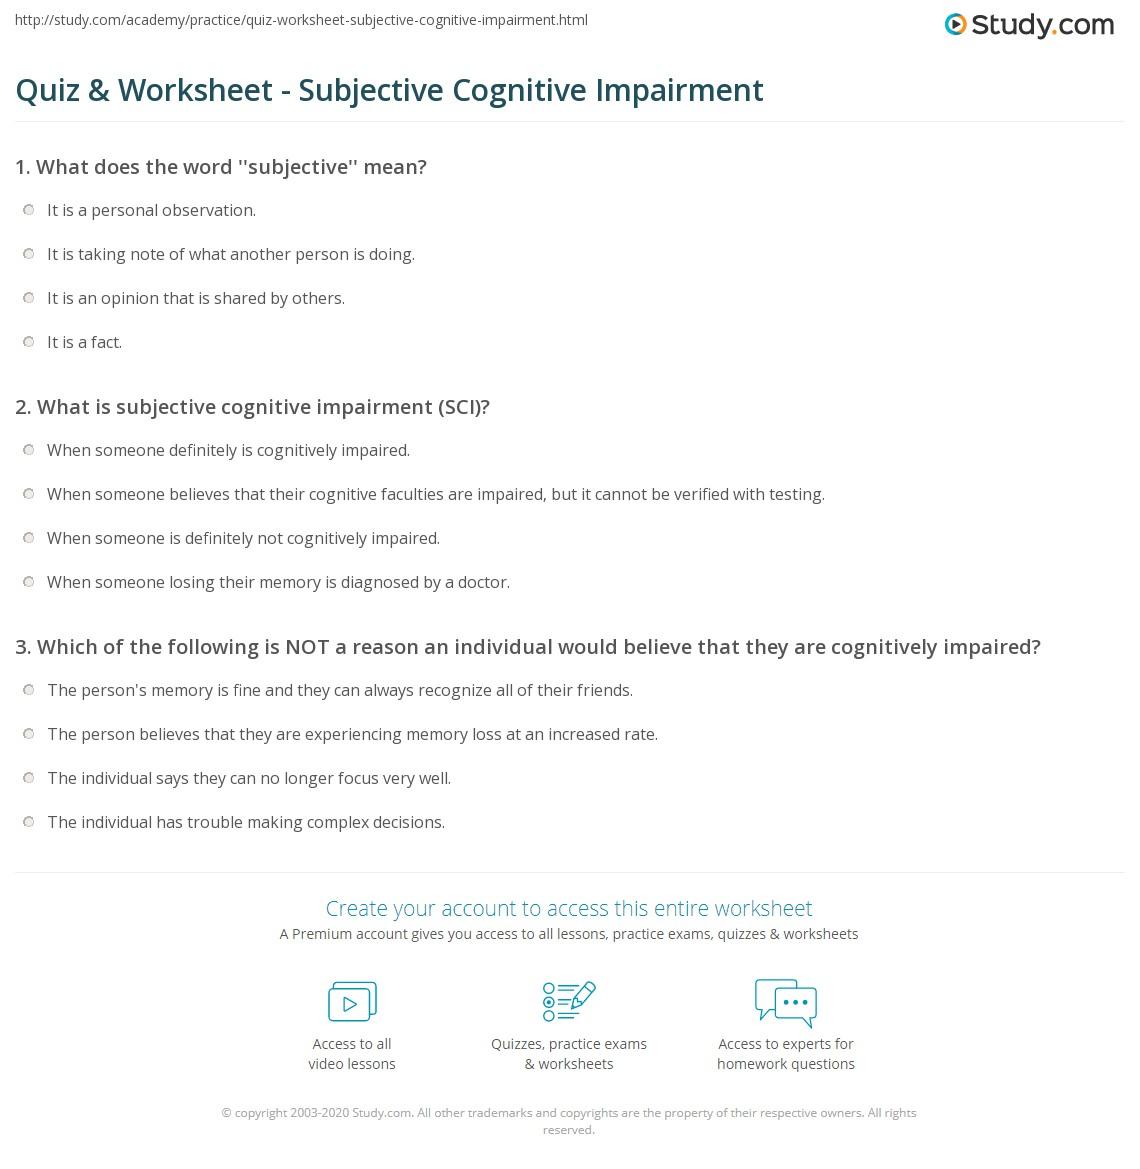 Quiz & Worksheet Subjective Cognitive Impairment